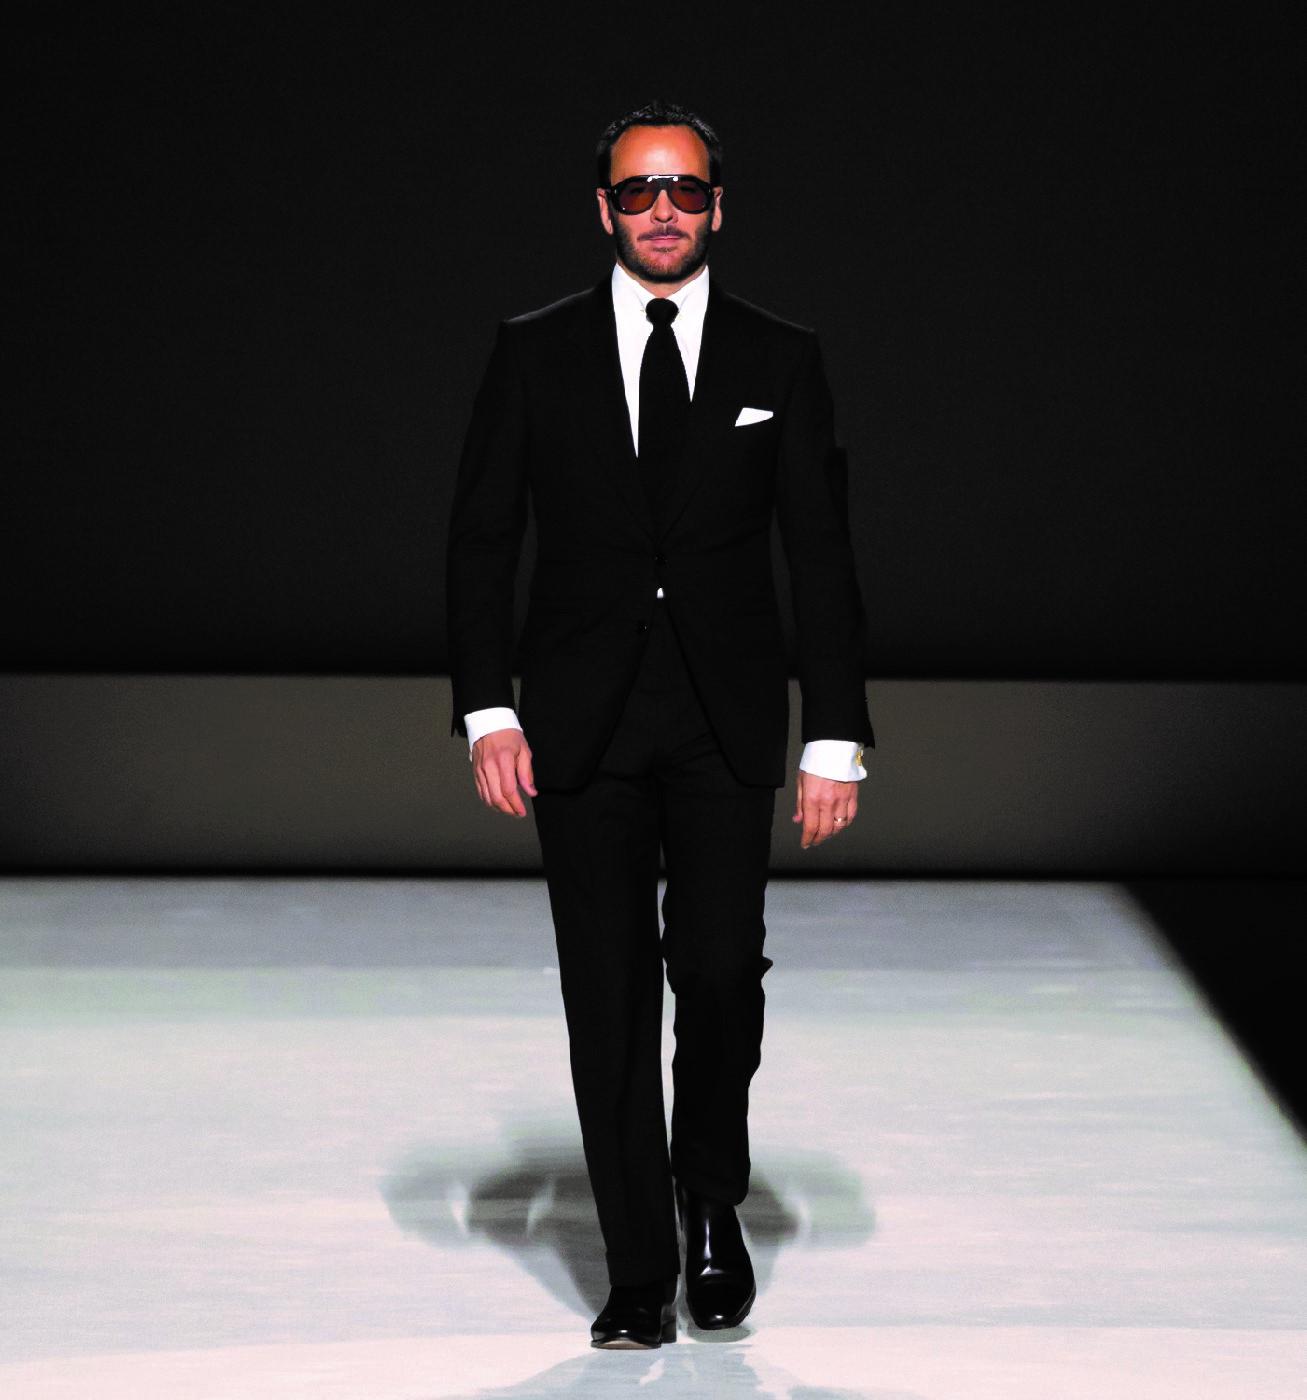 Tom Ford model on the catwalk